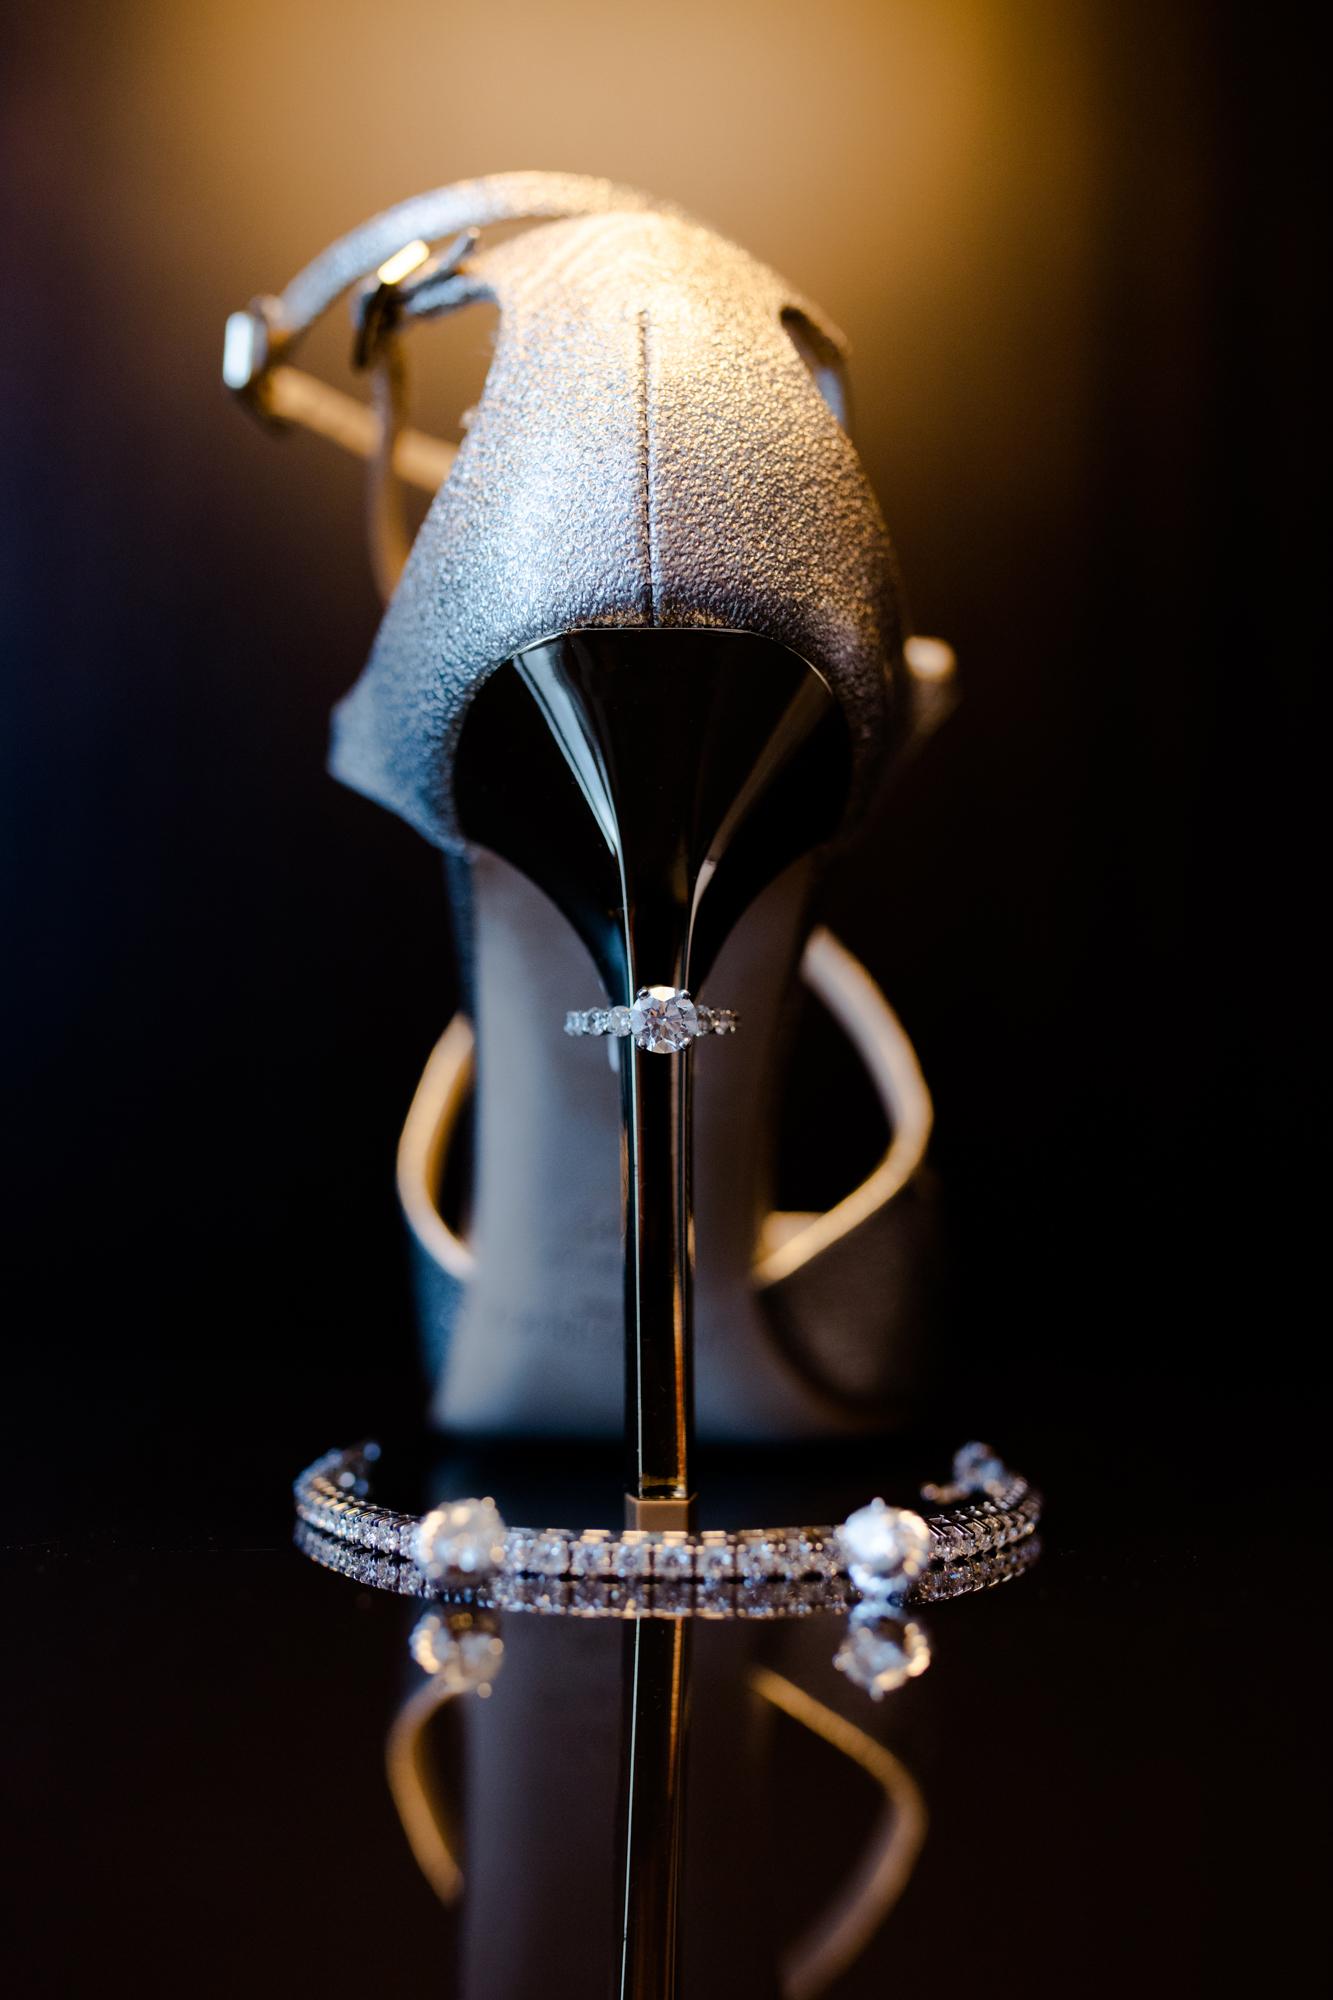 Jimmy Choo bridal shoes - Chicago wedding